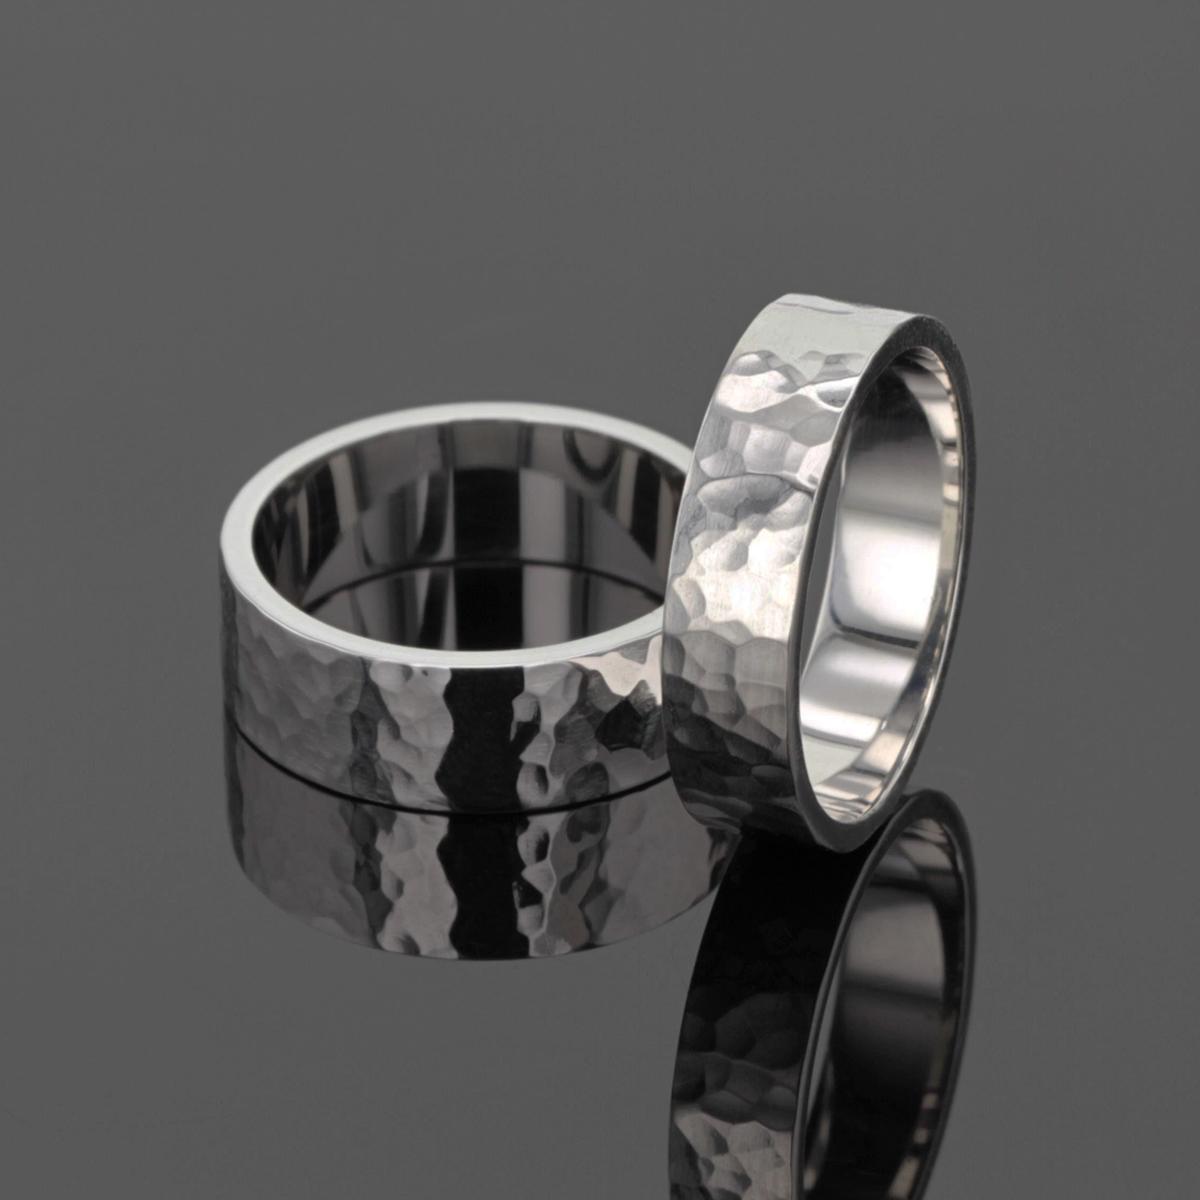 White gold wedding rings Mauritius